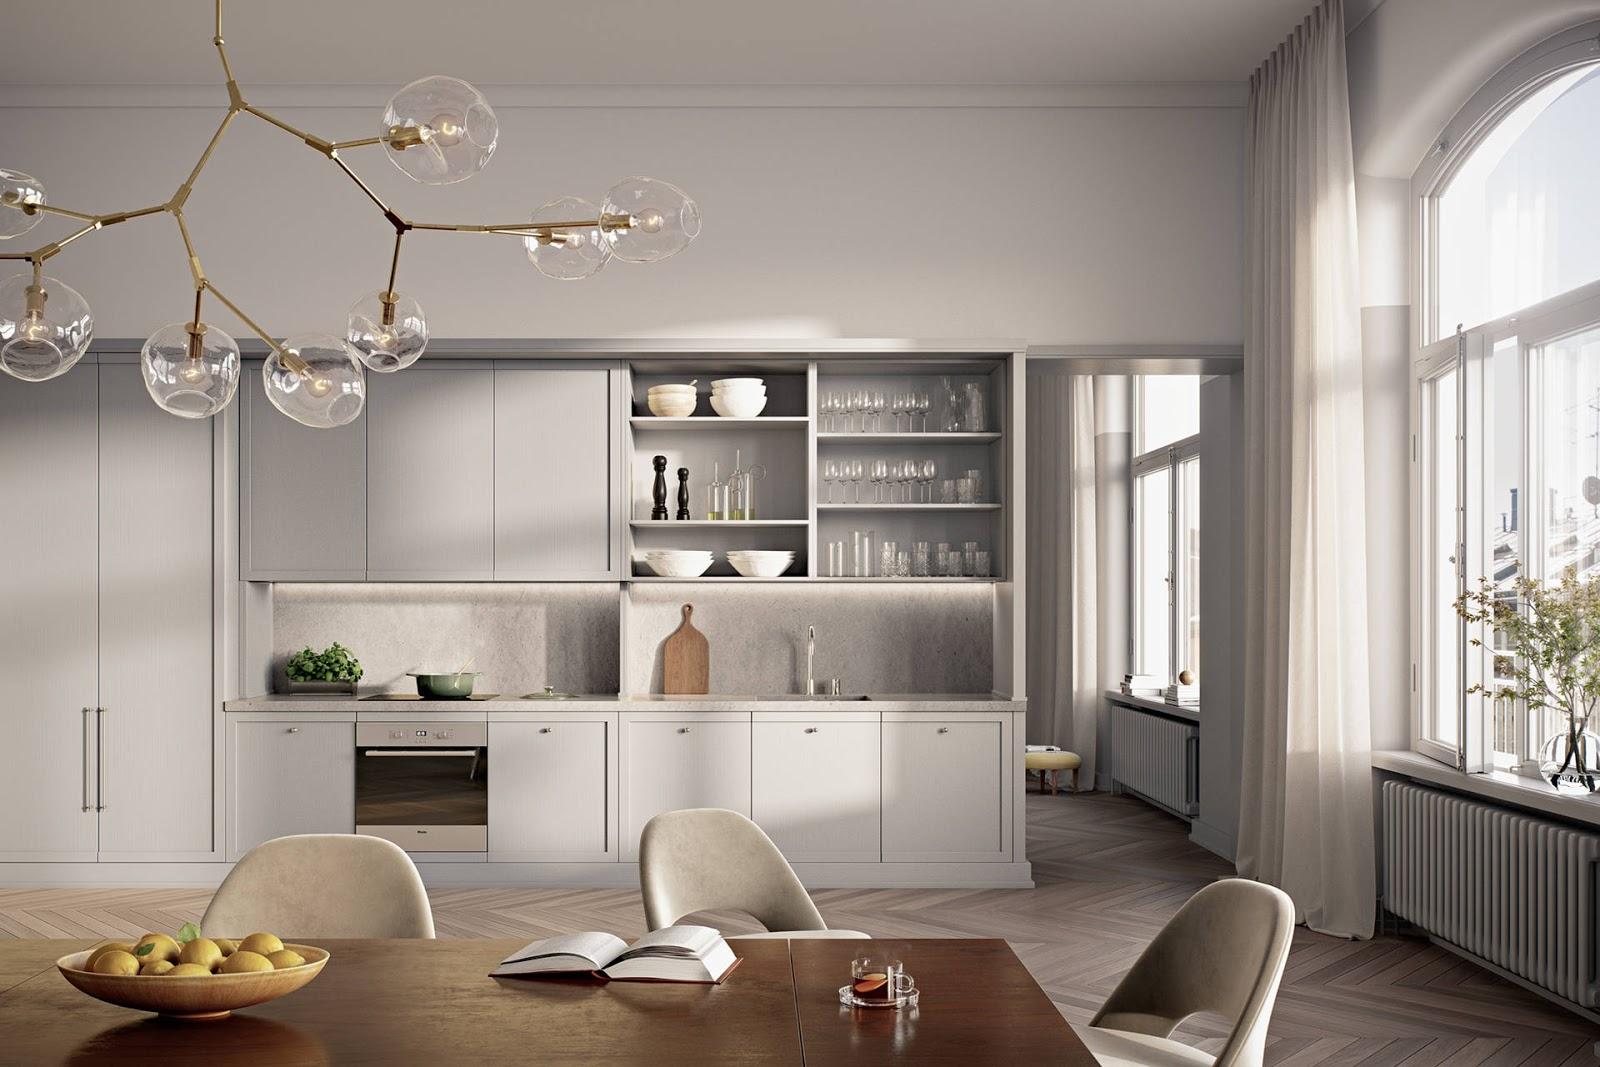 scandinavian interior kitchen, mid century modern chairs, dining table, herringbone floor